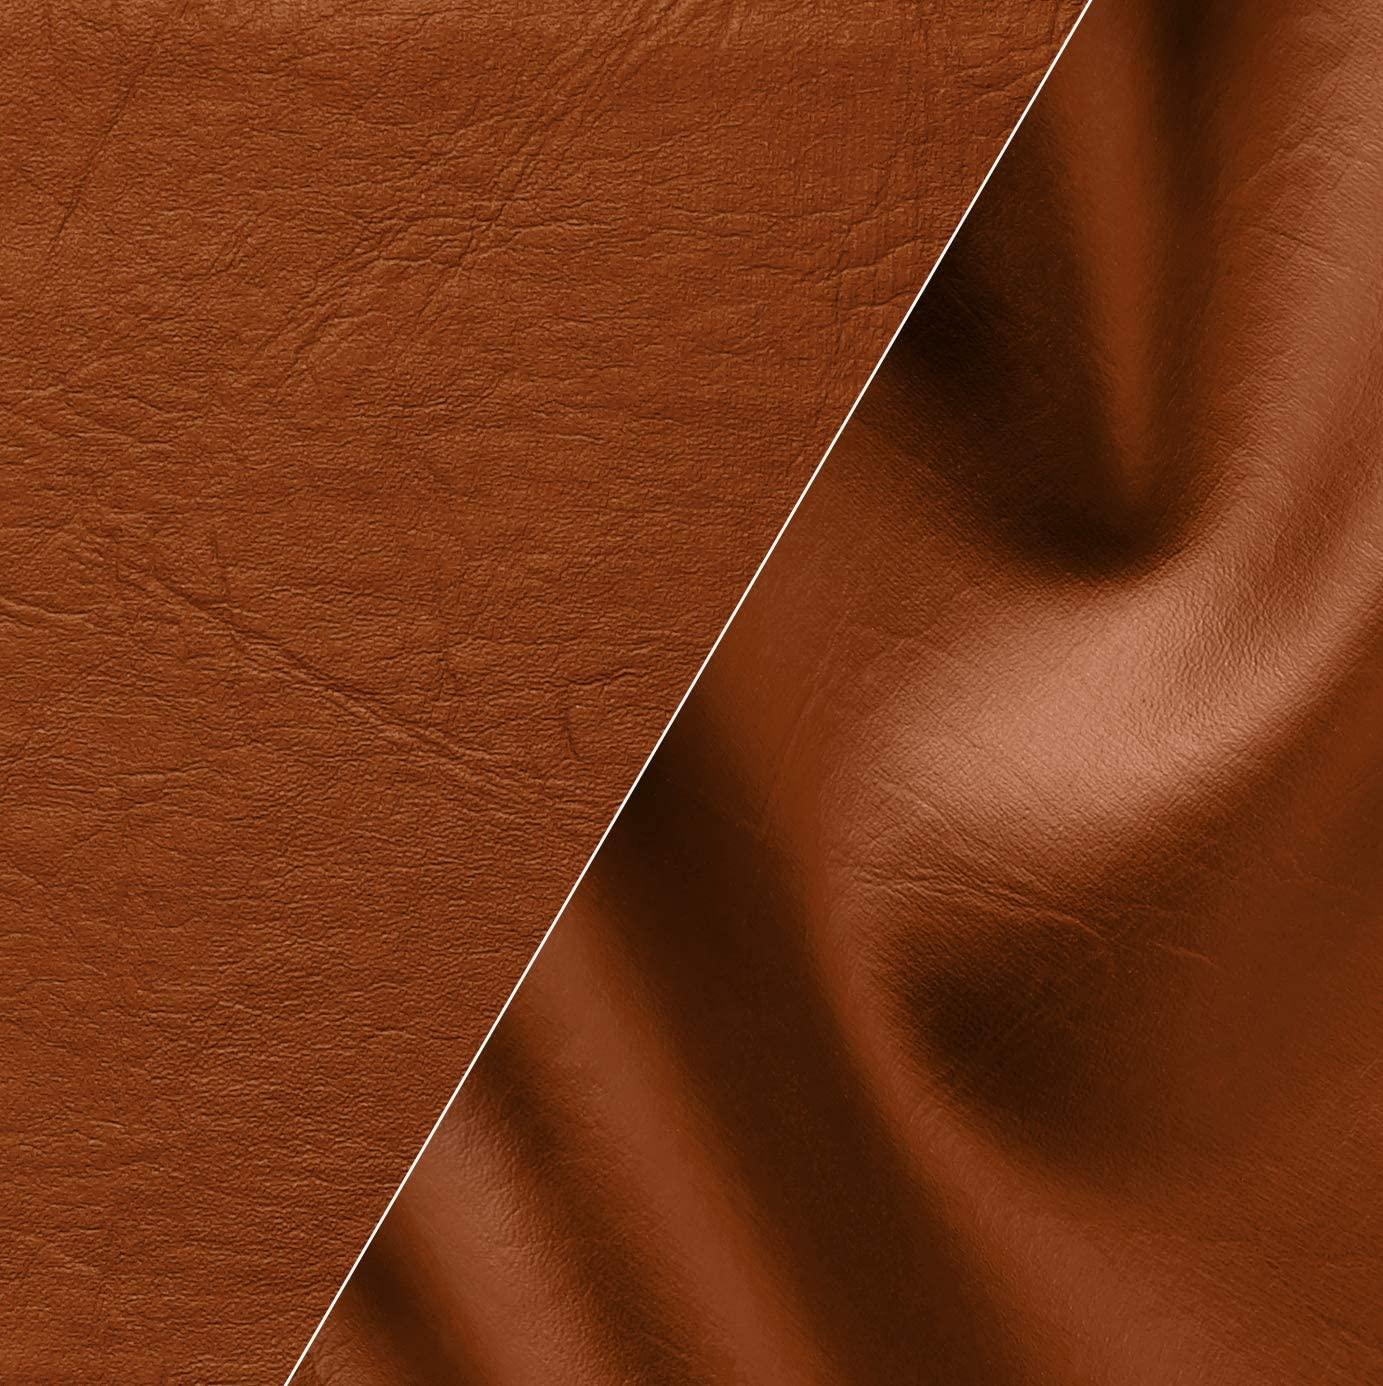 VViViD Light Brown Weatherproof Faux Leather Finish Marine Vinyl Fabric (1.5ft x 54